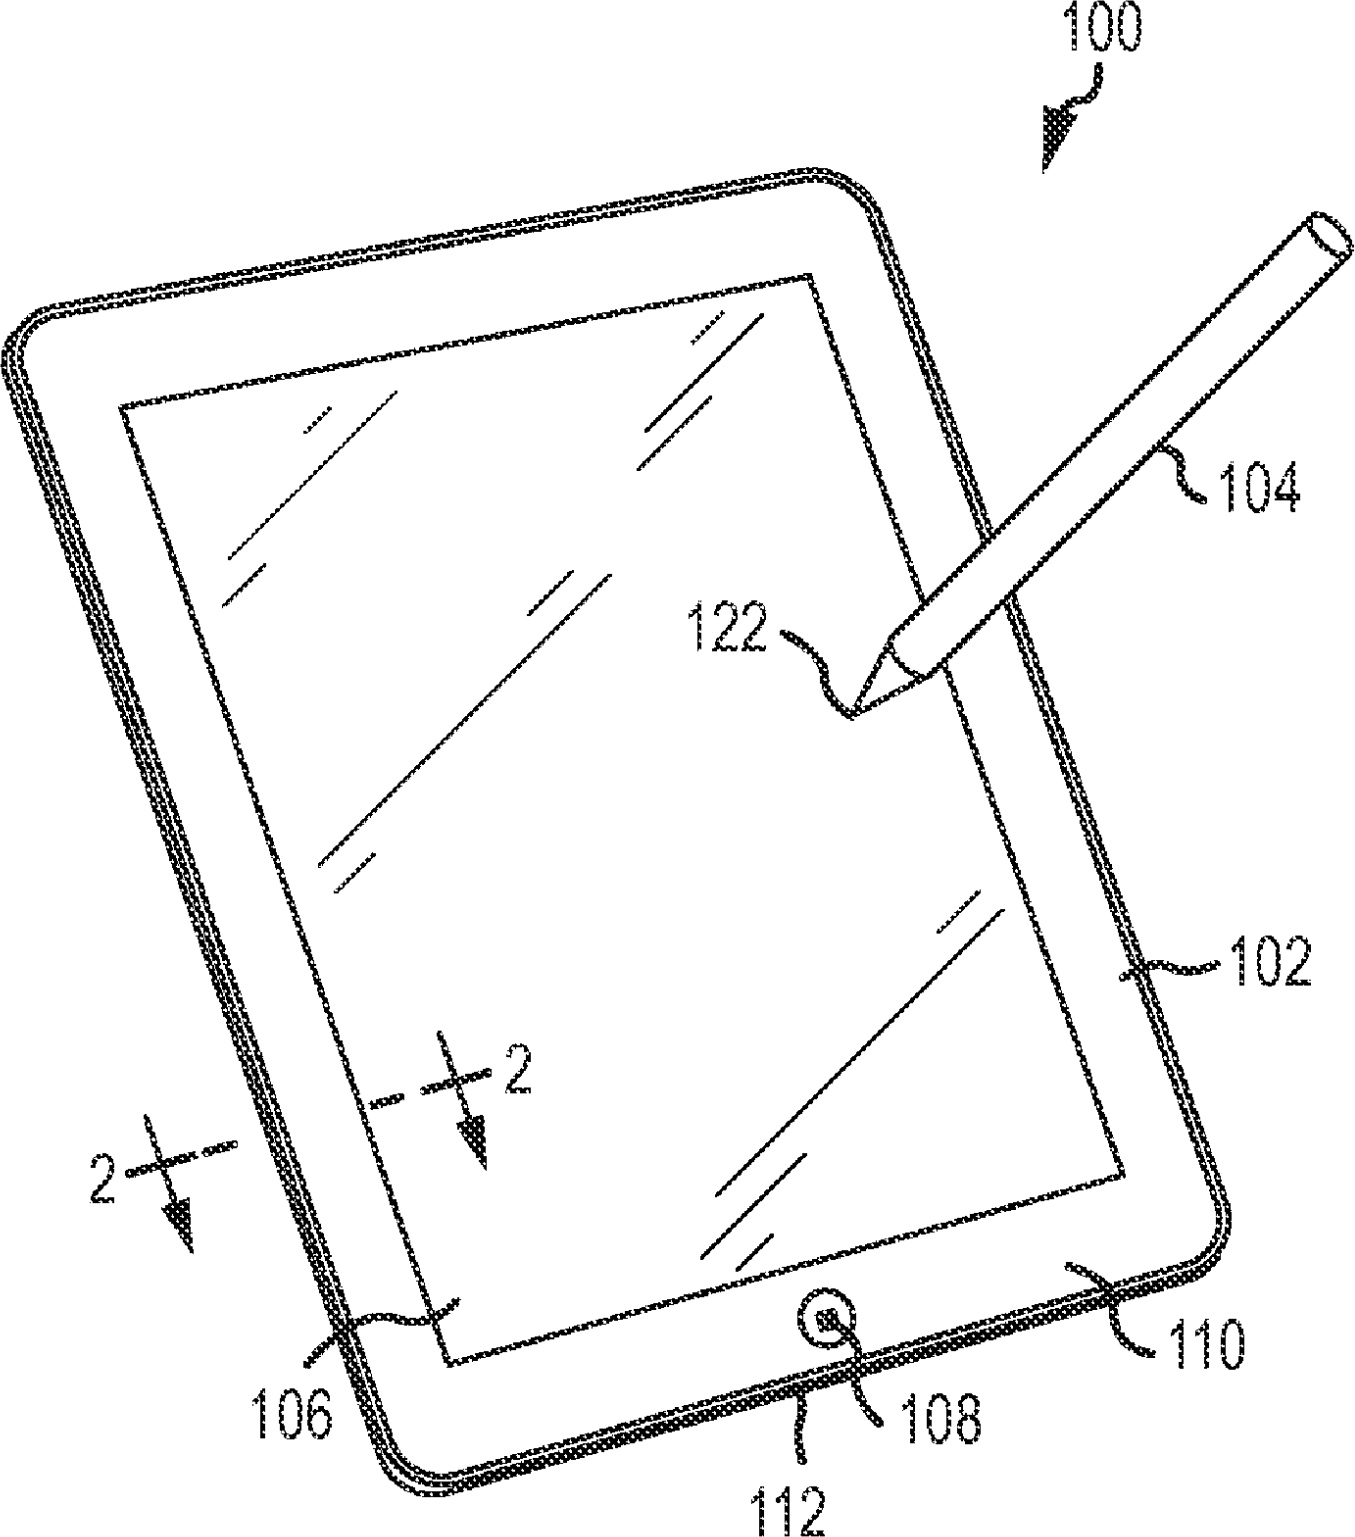 Patente da Apple cobrindo uma stylus